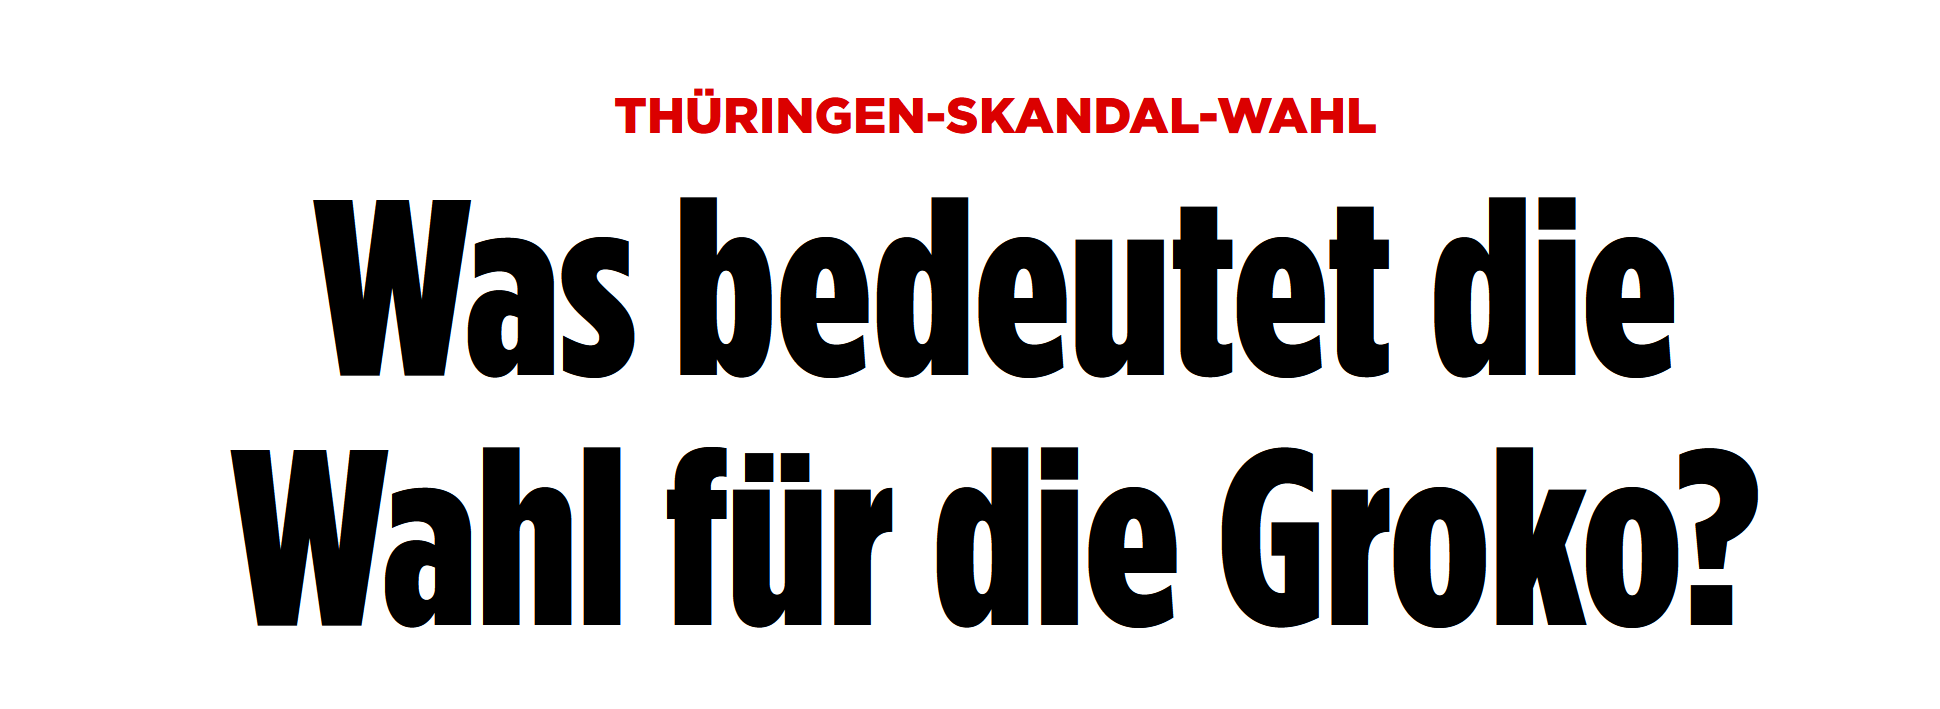 "BILD: ""Thüringen-Skandal-Wahl: Was bedeutet die Wahl für die Groko?"""